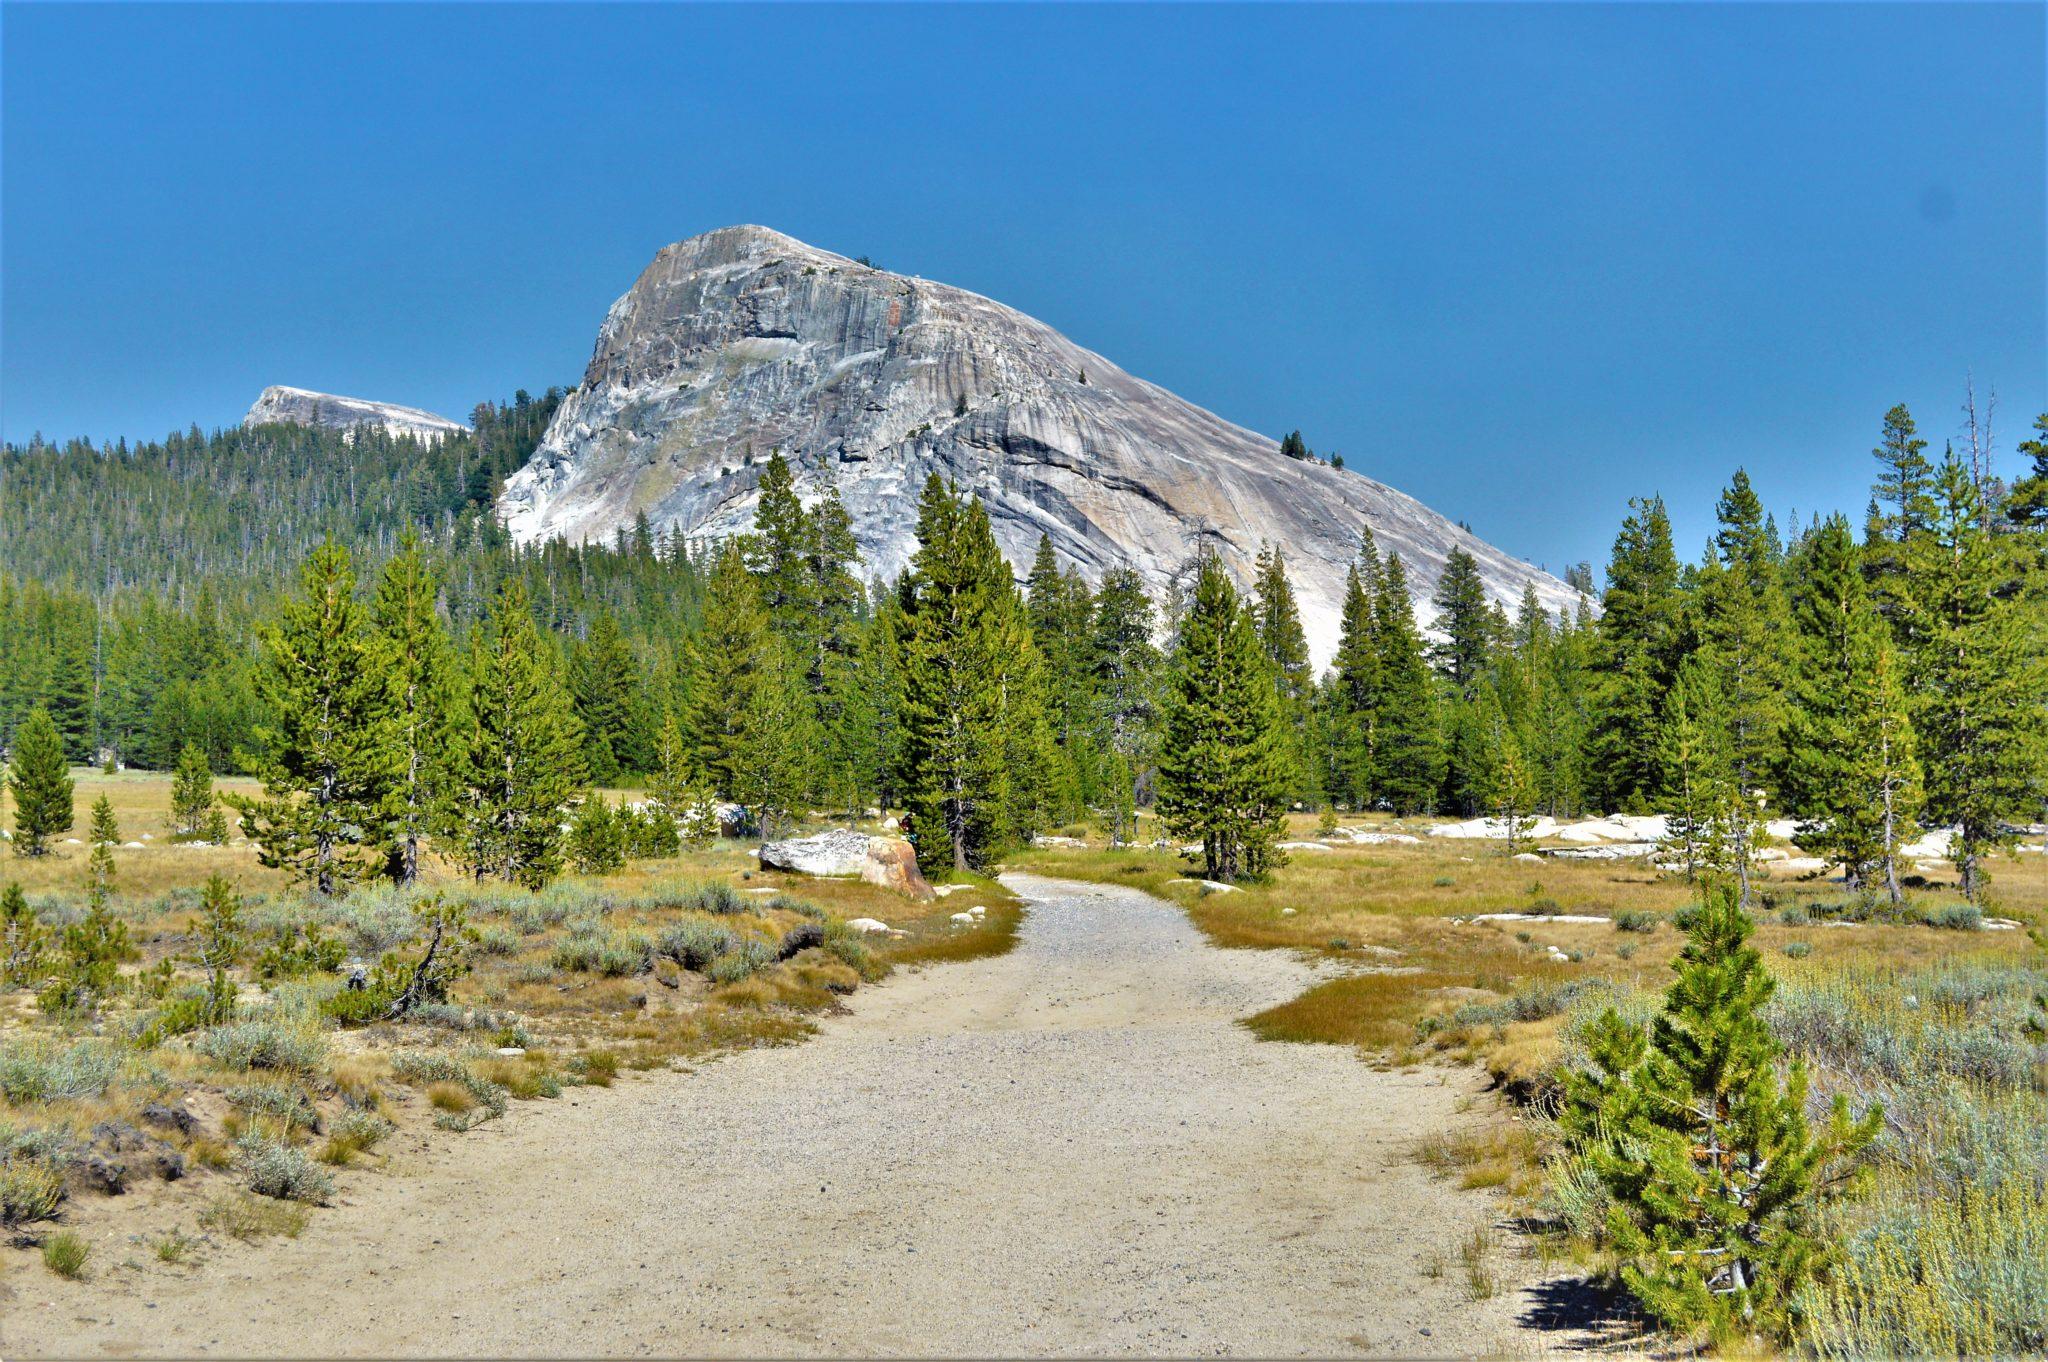 PCT hiking trail, Yosemite National Park, California, things to do at yosemite